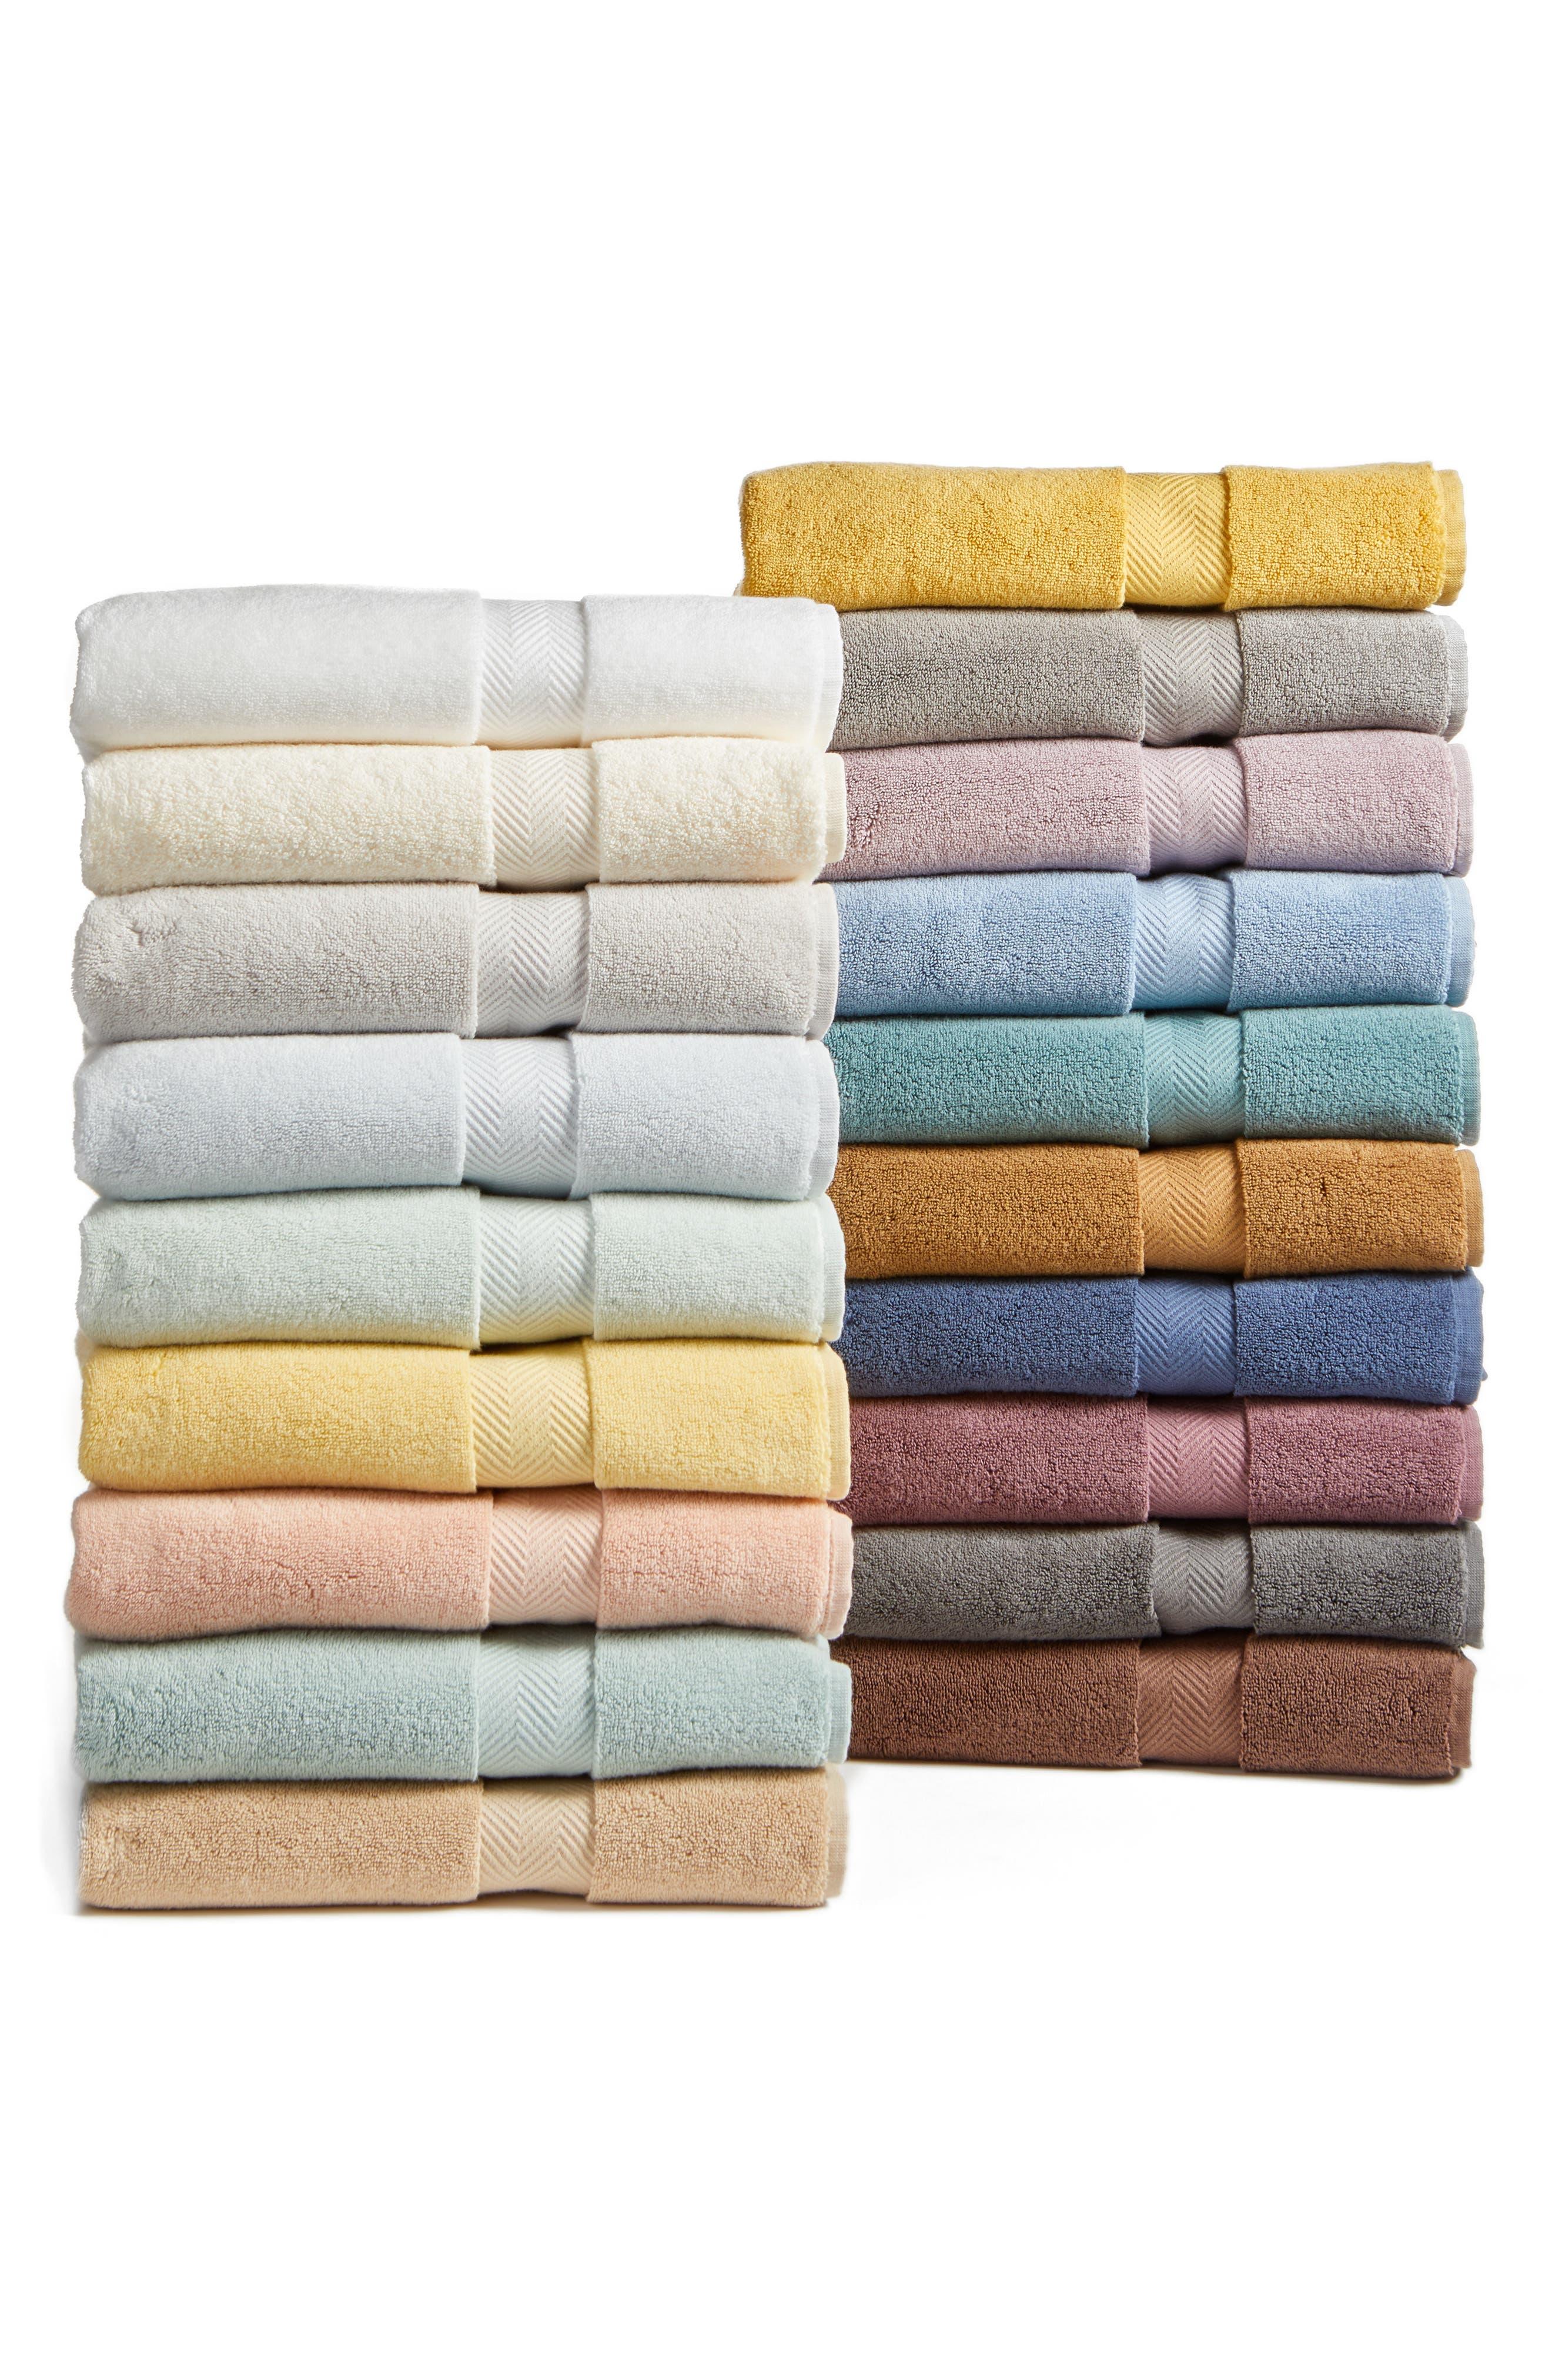 Monogram bathroom towels - Monogram Bathroom Towels 58